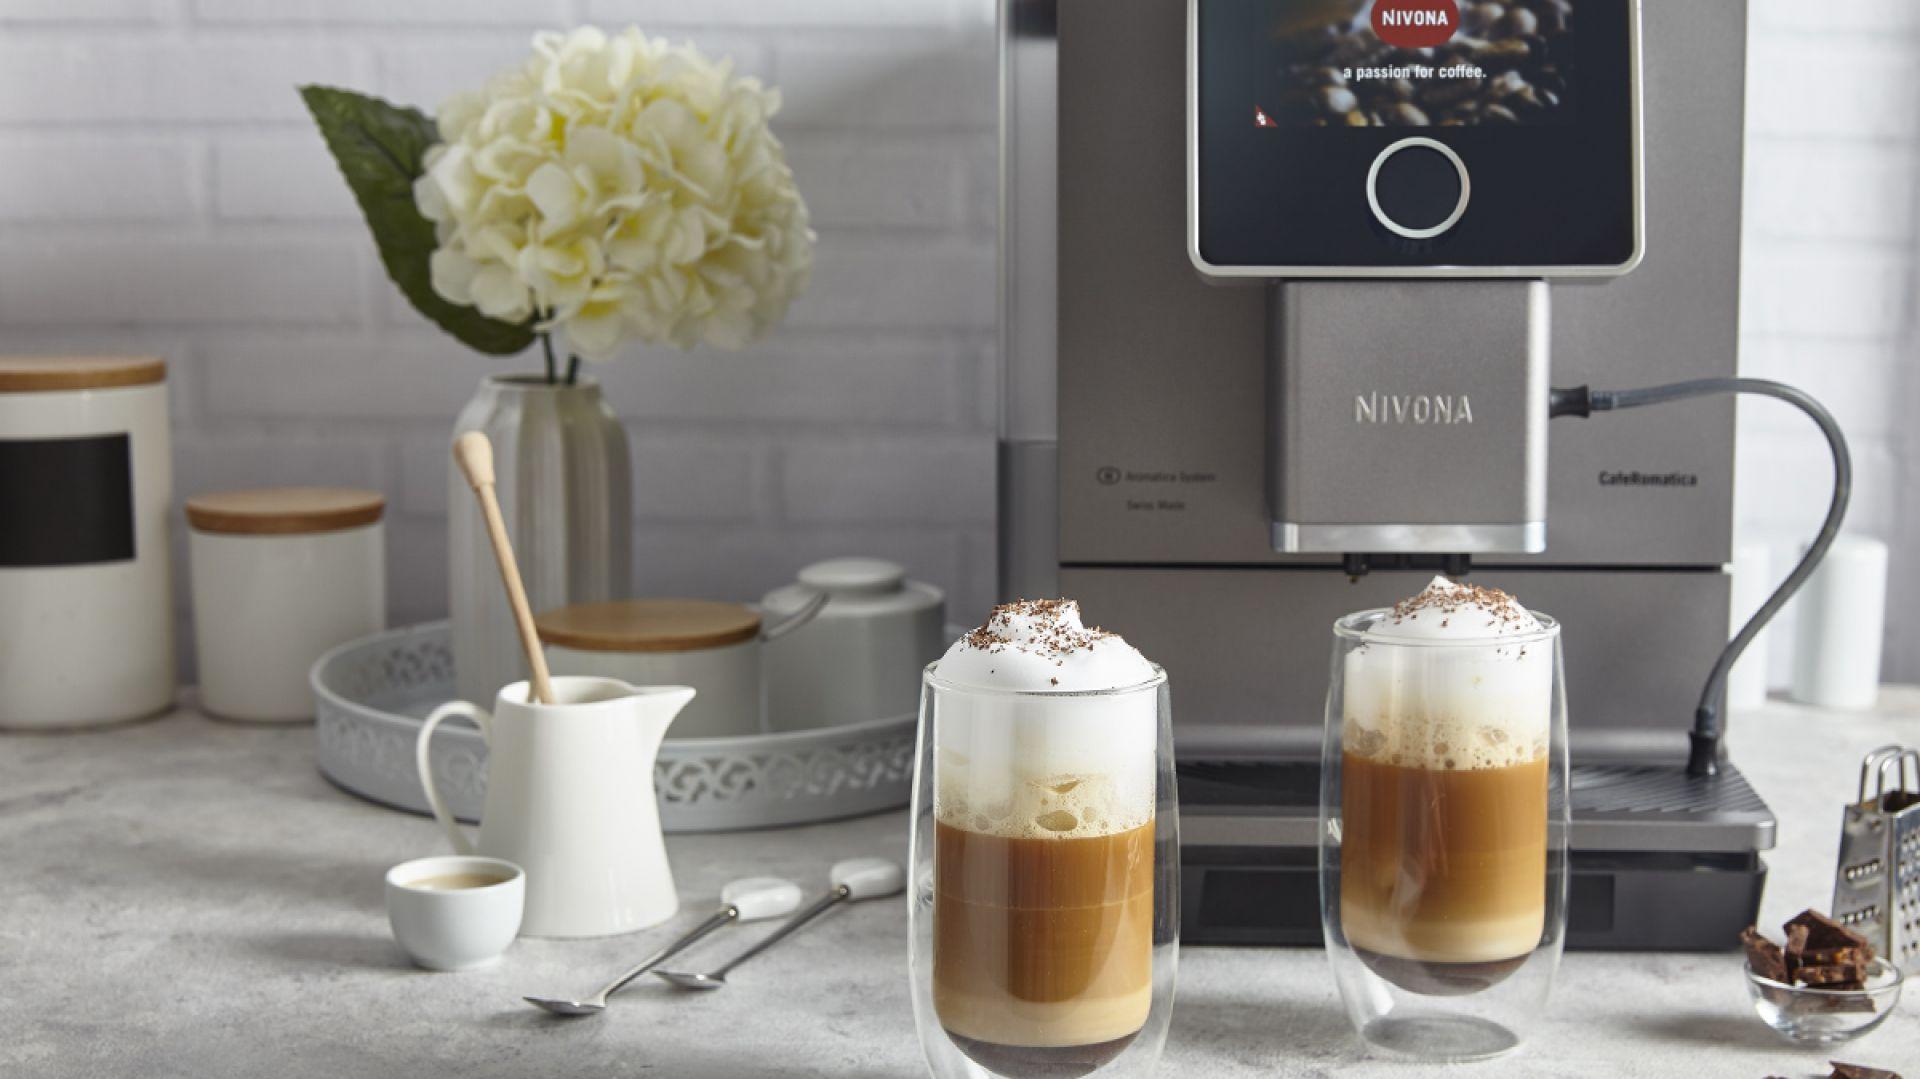 Caffè latte kasztanowe. Fot. Nivona